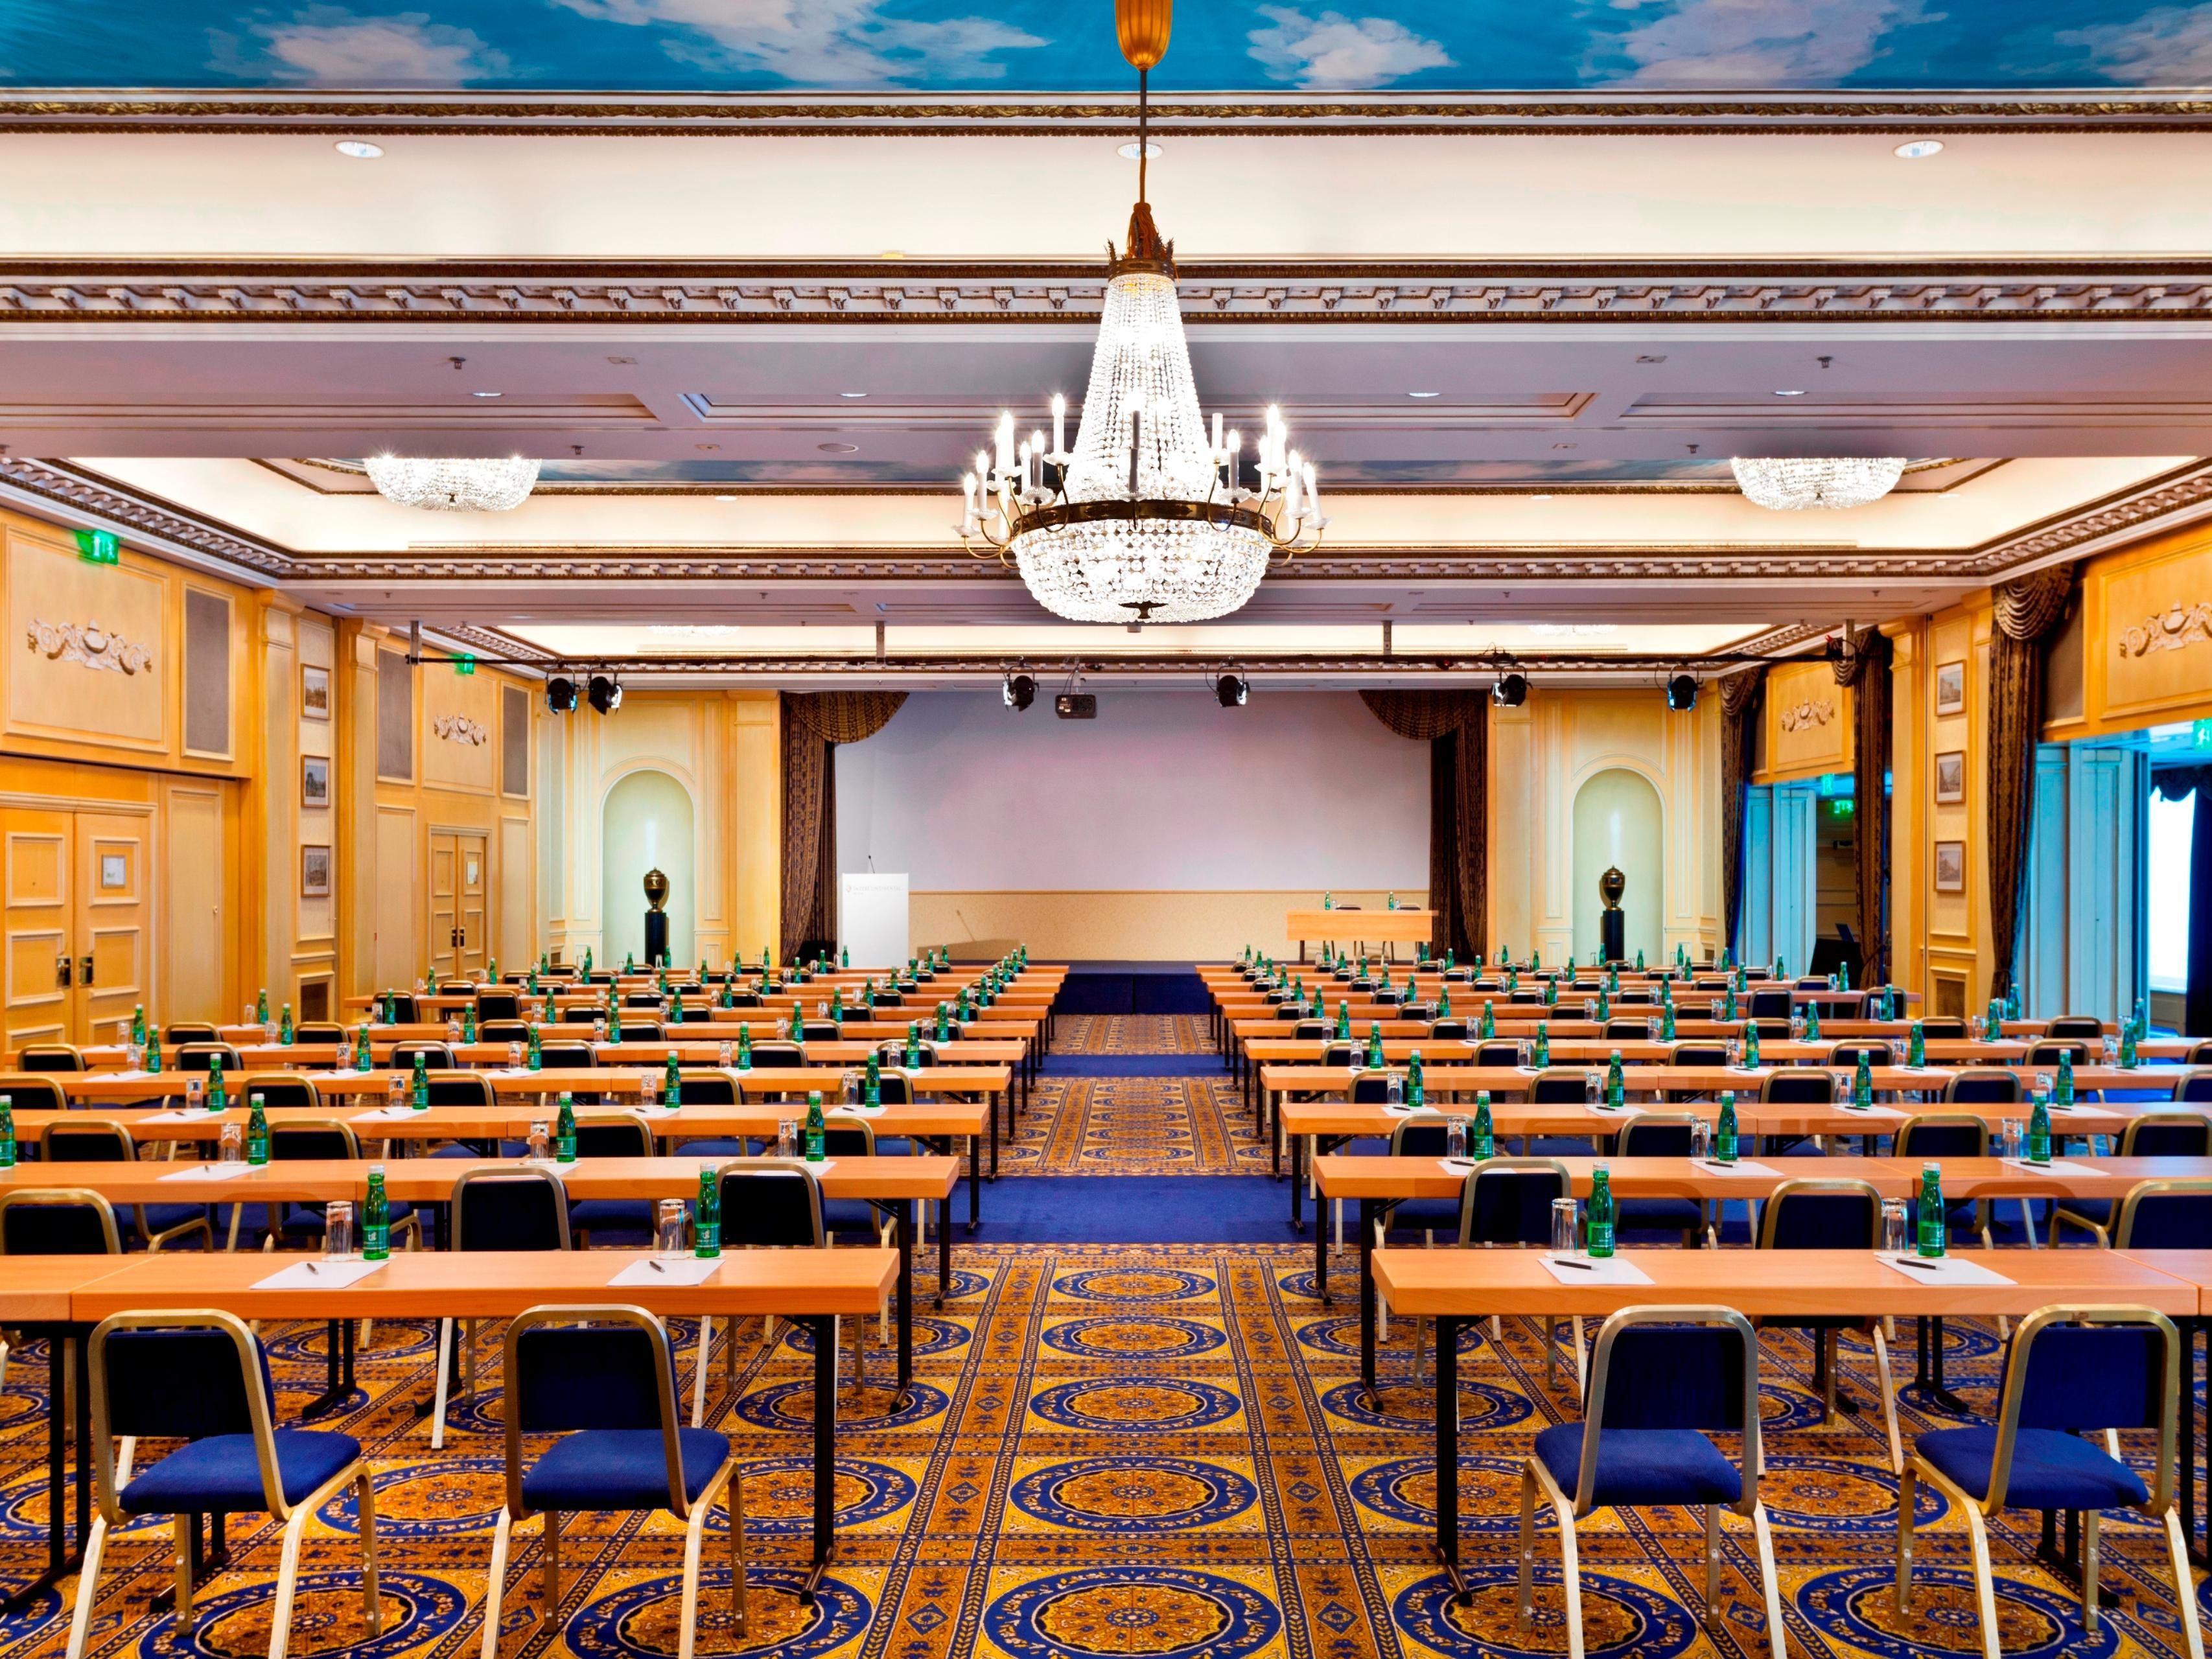 هتل اینترکانتیننتال وین